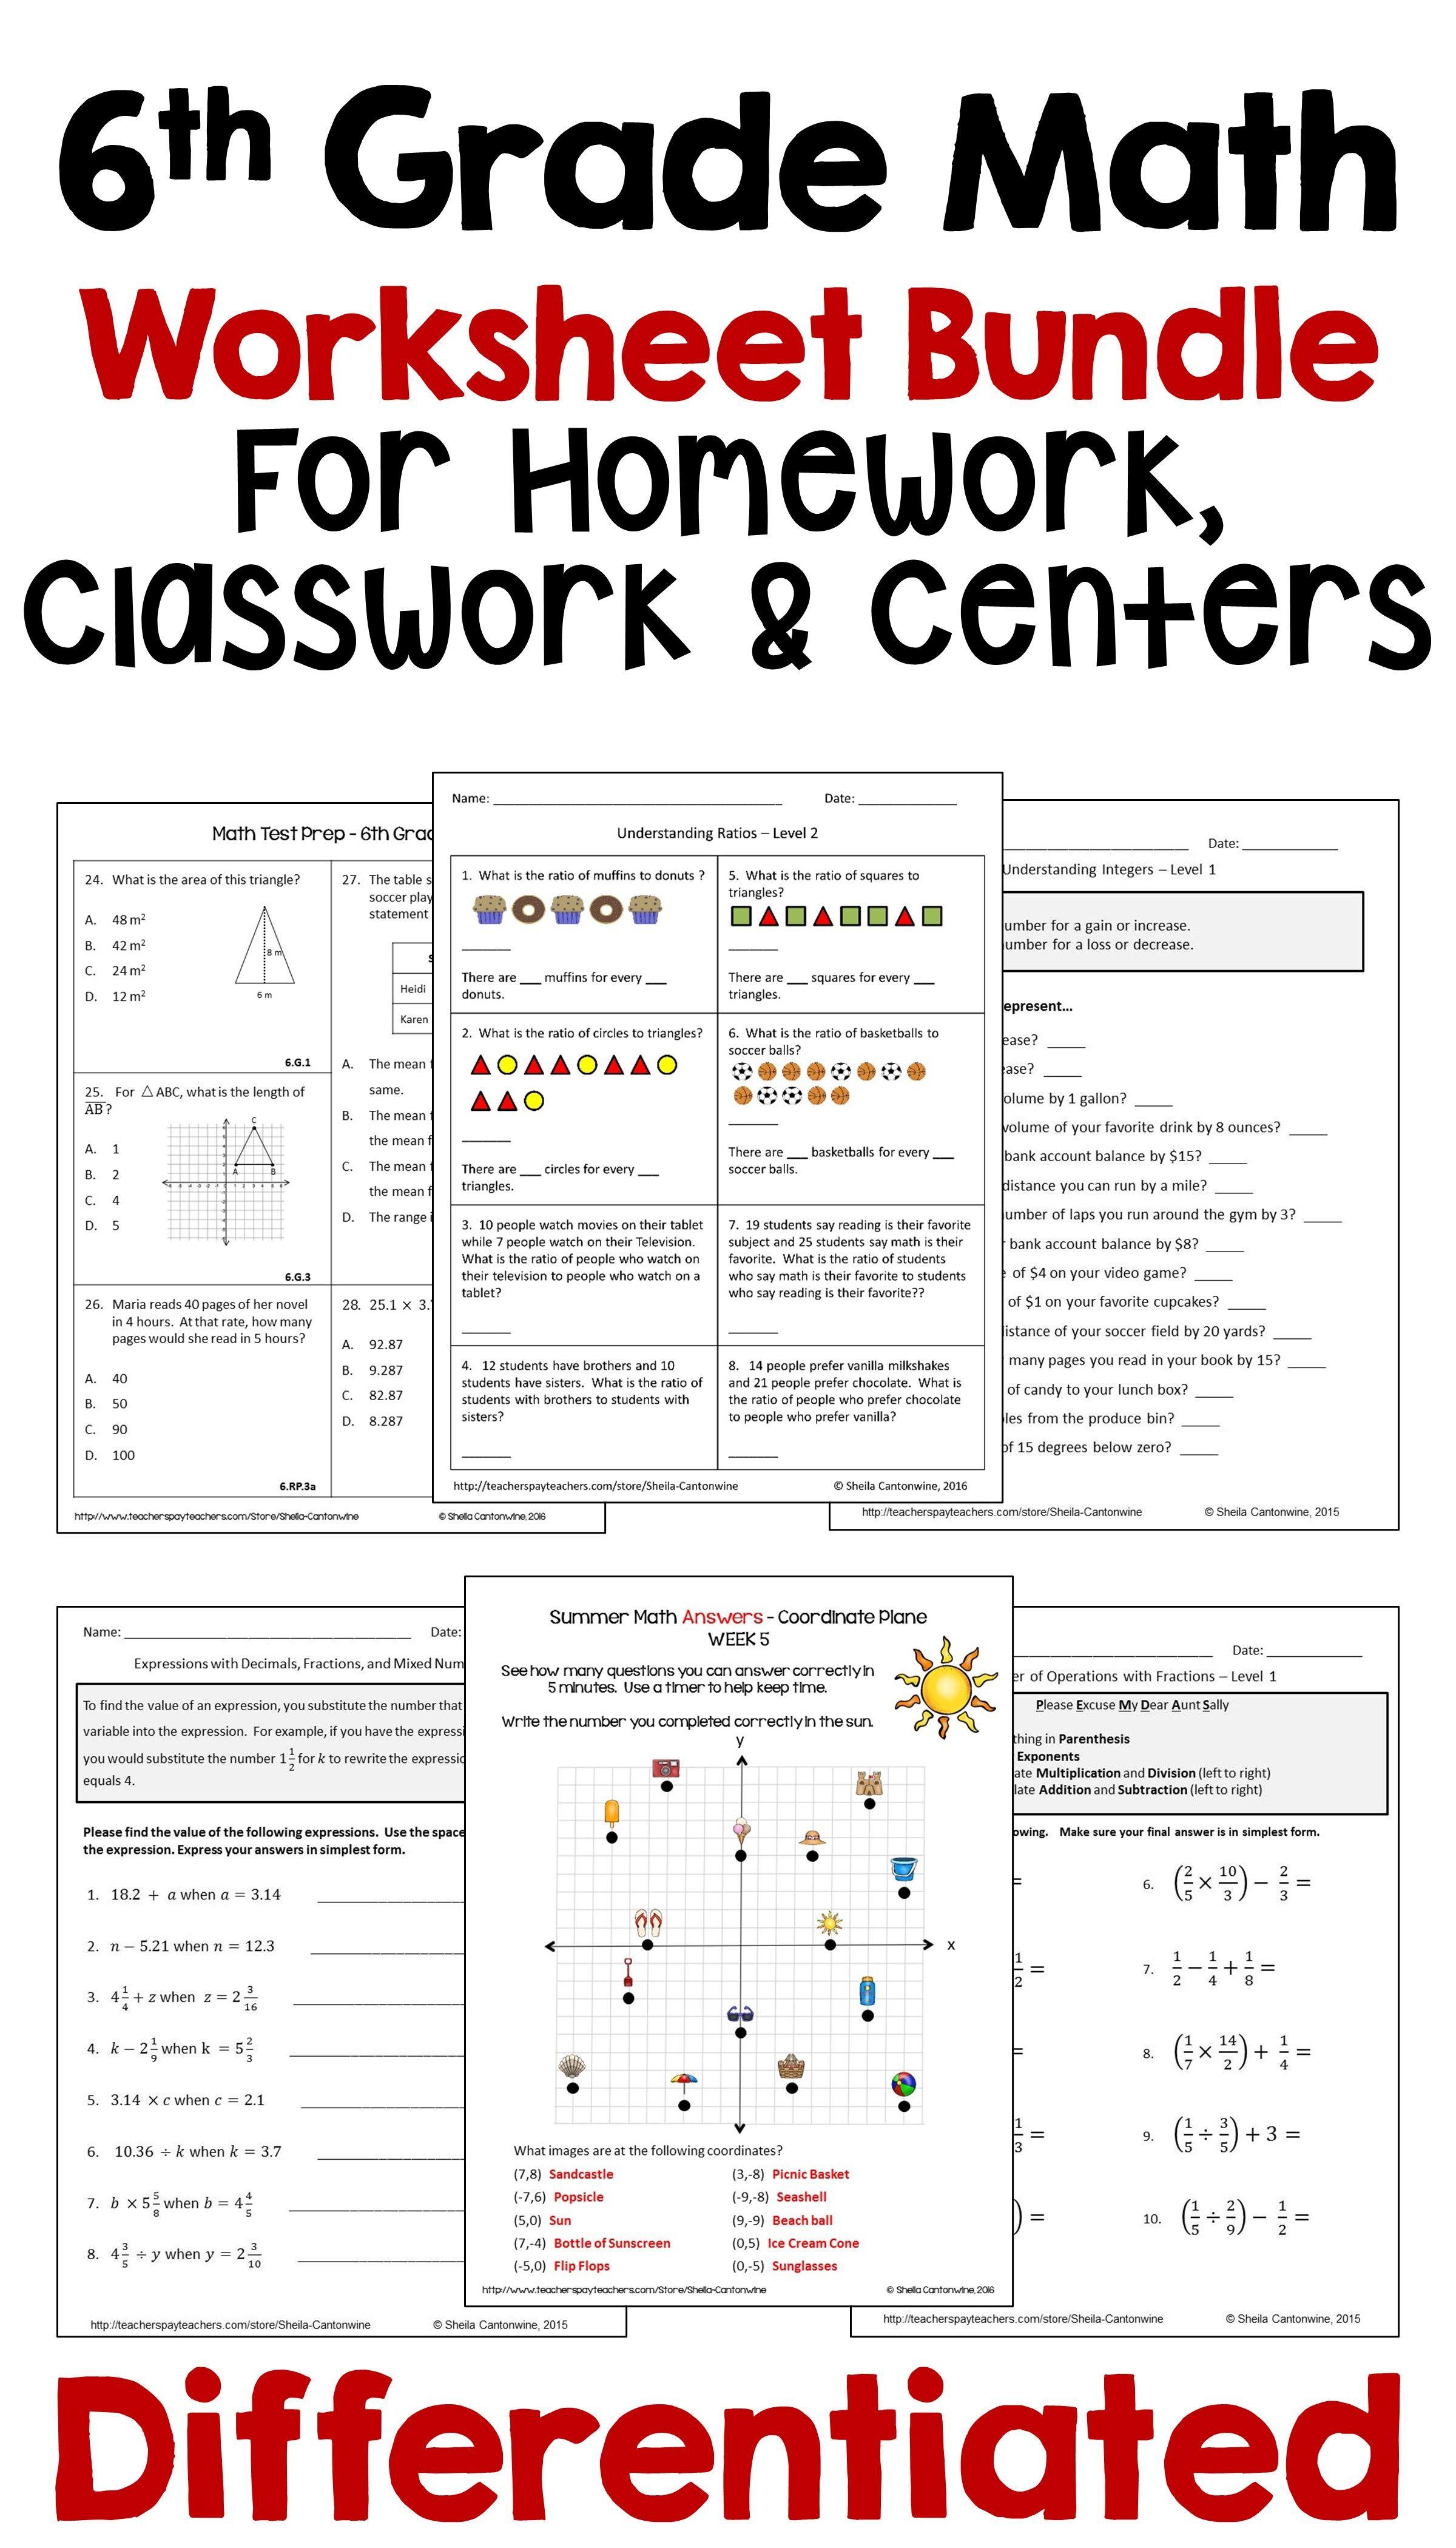 medium resolution of 6th Grade Math Worksheet Bundle for Homework